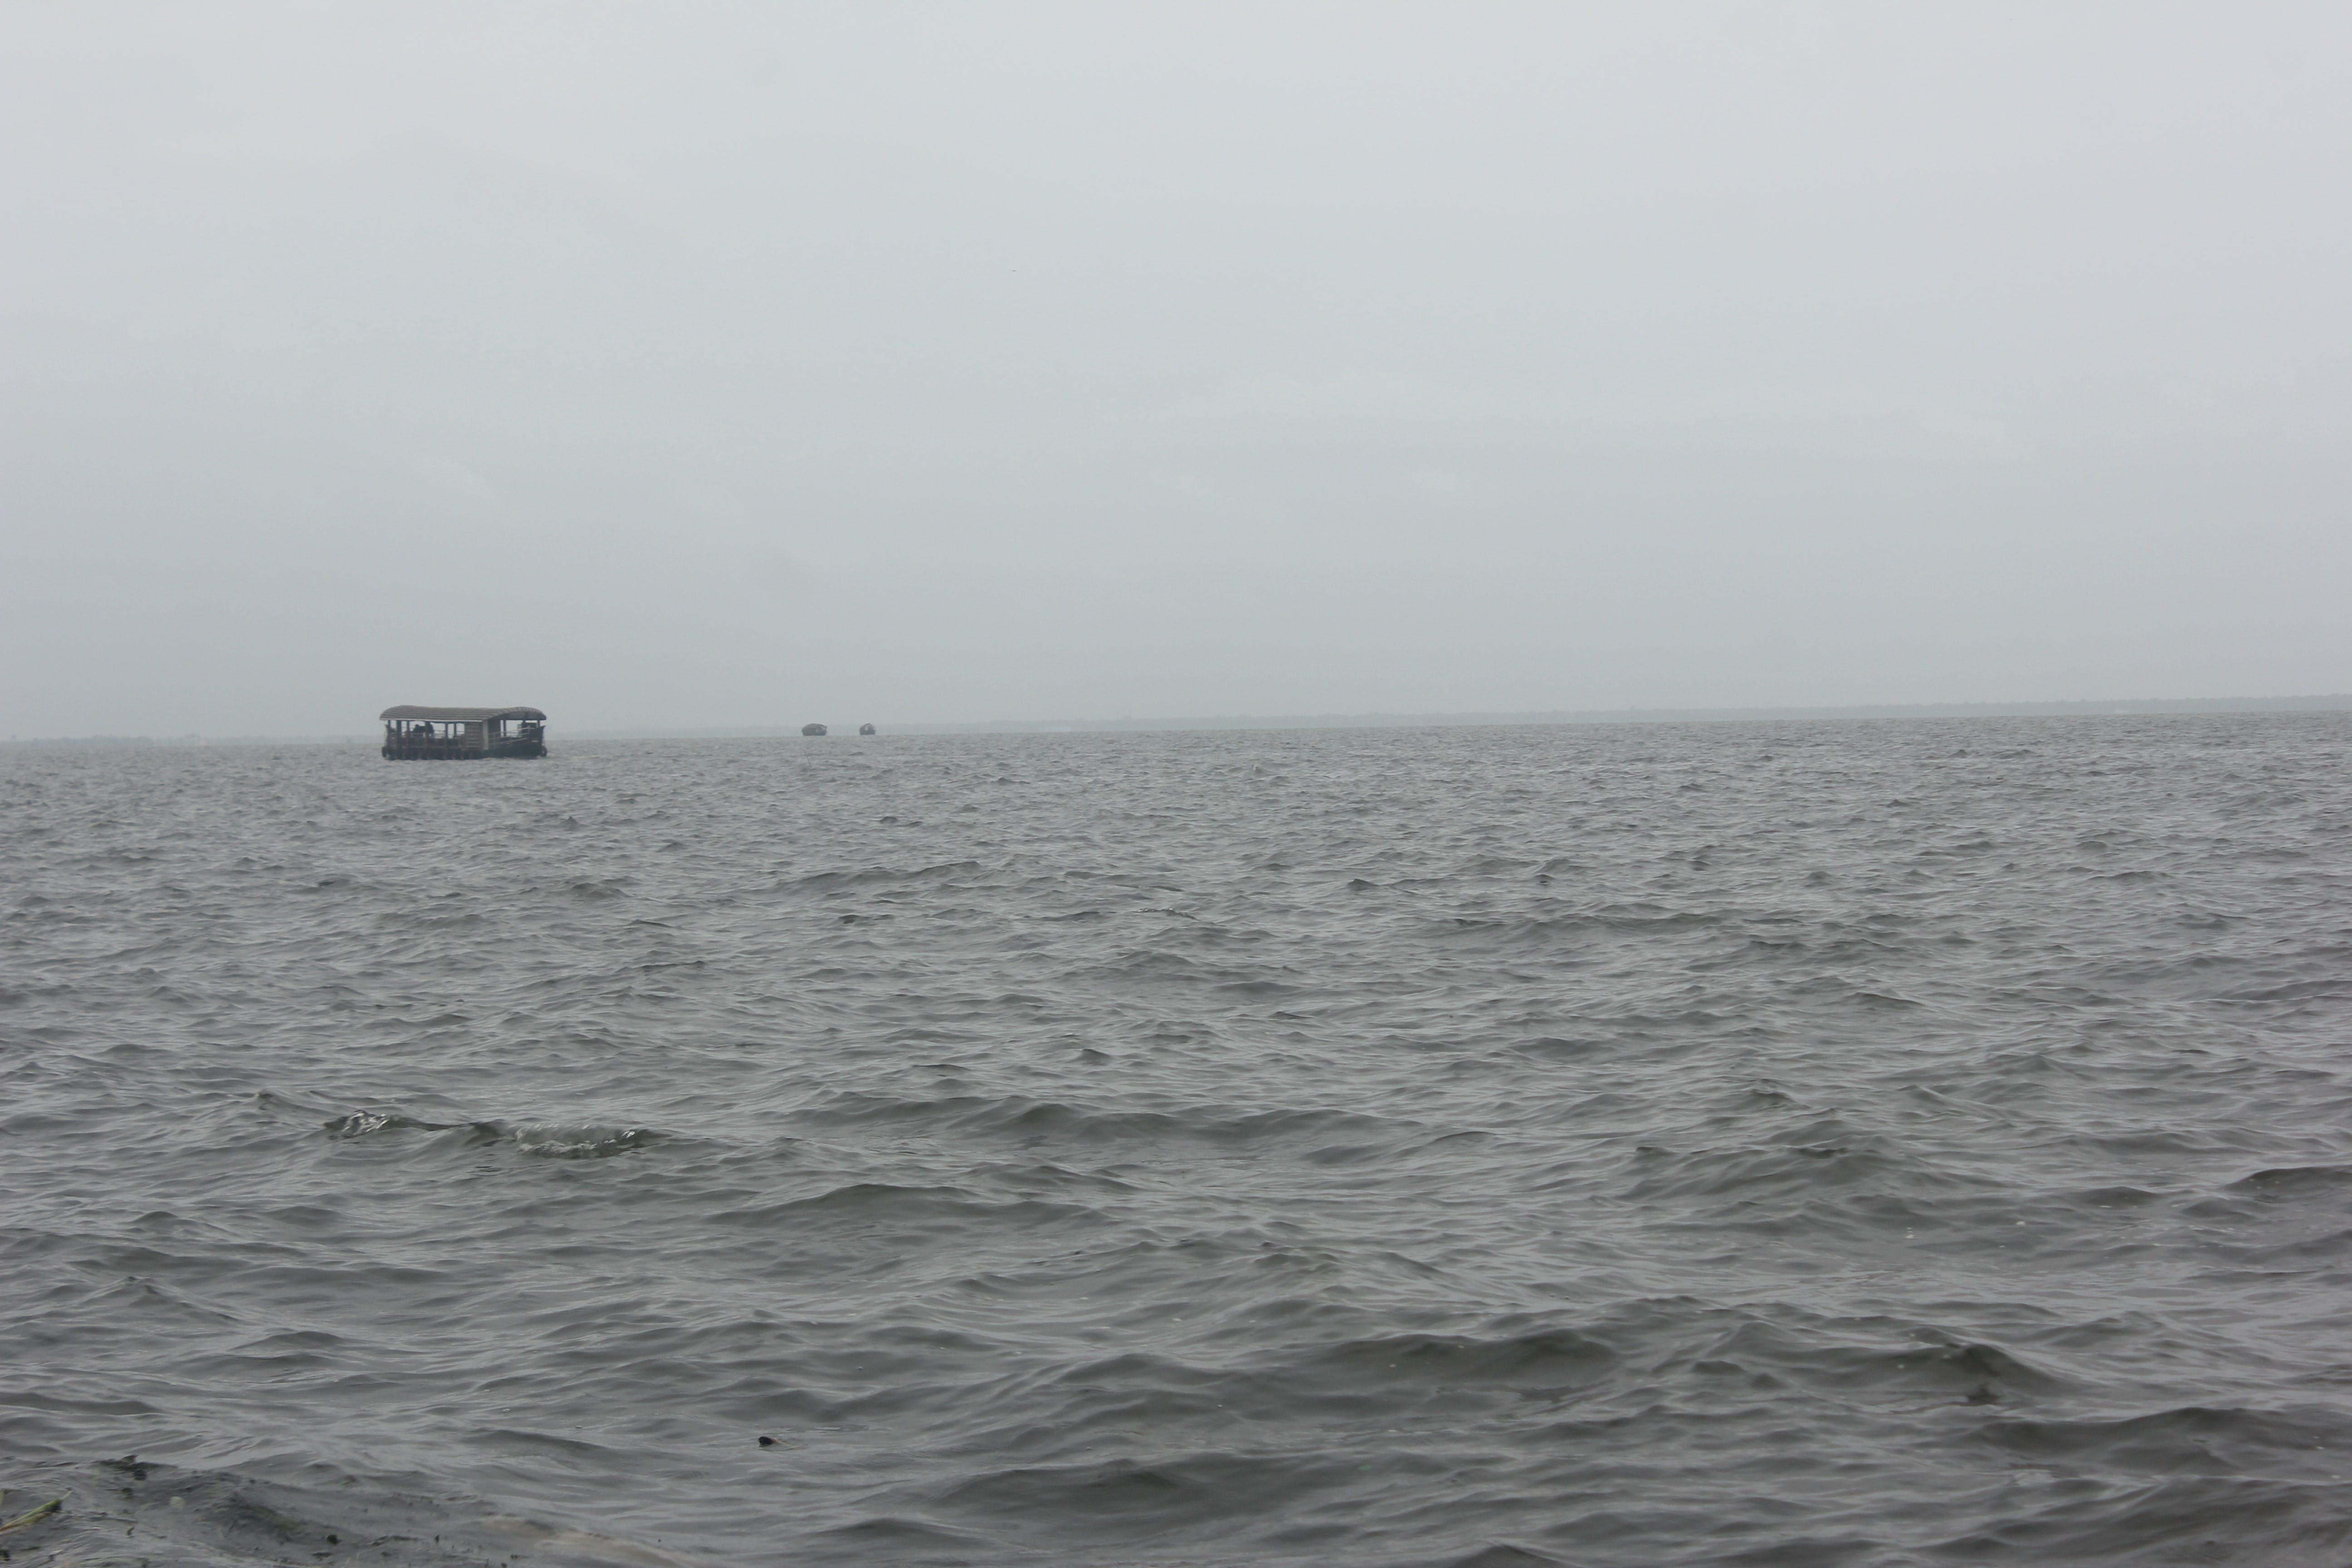 Free stock photo of boat, houseboat, ocean, scenic